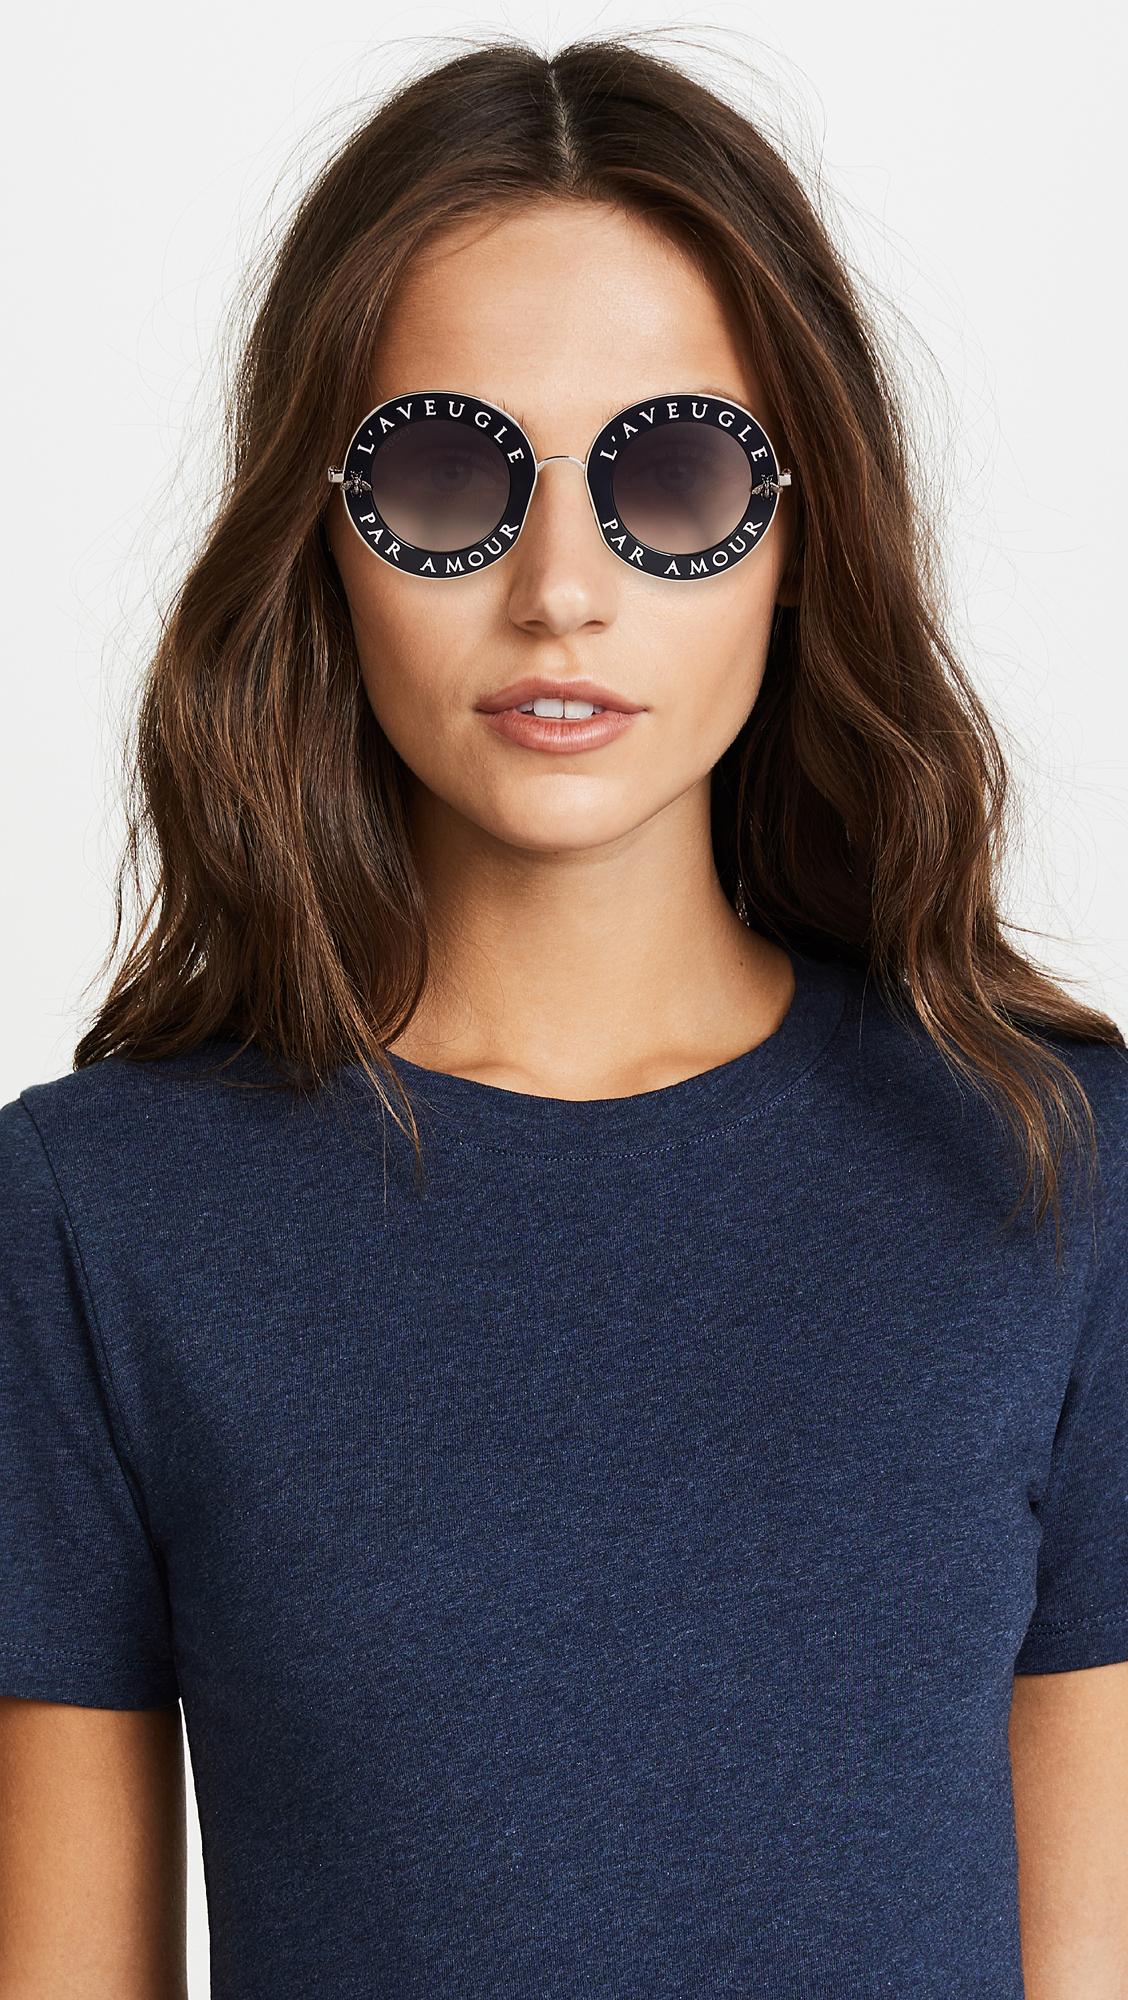 5f2711f1f39 Gucci L Aveugle Par Amour Round Sunglasses